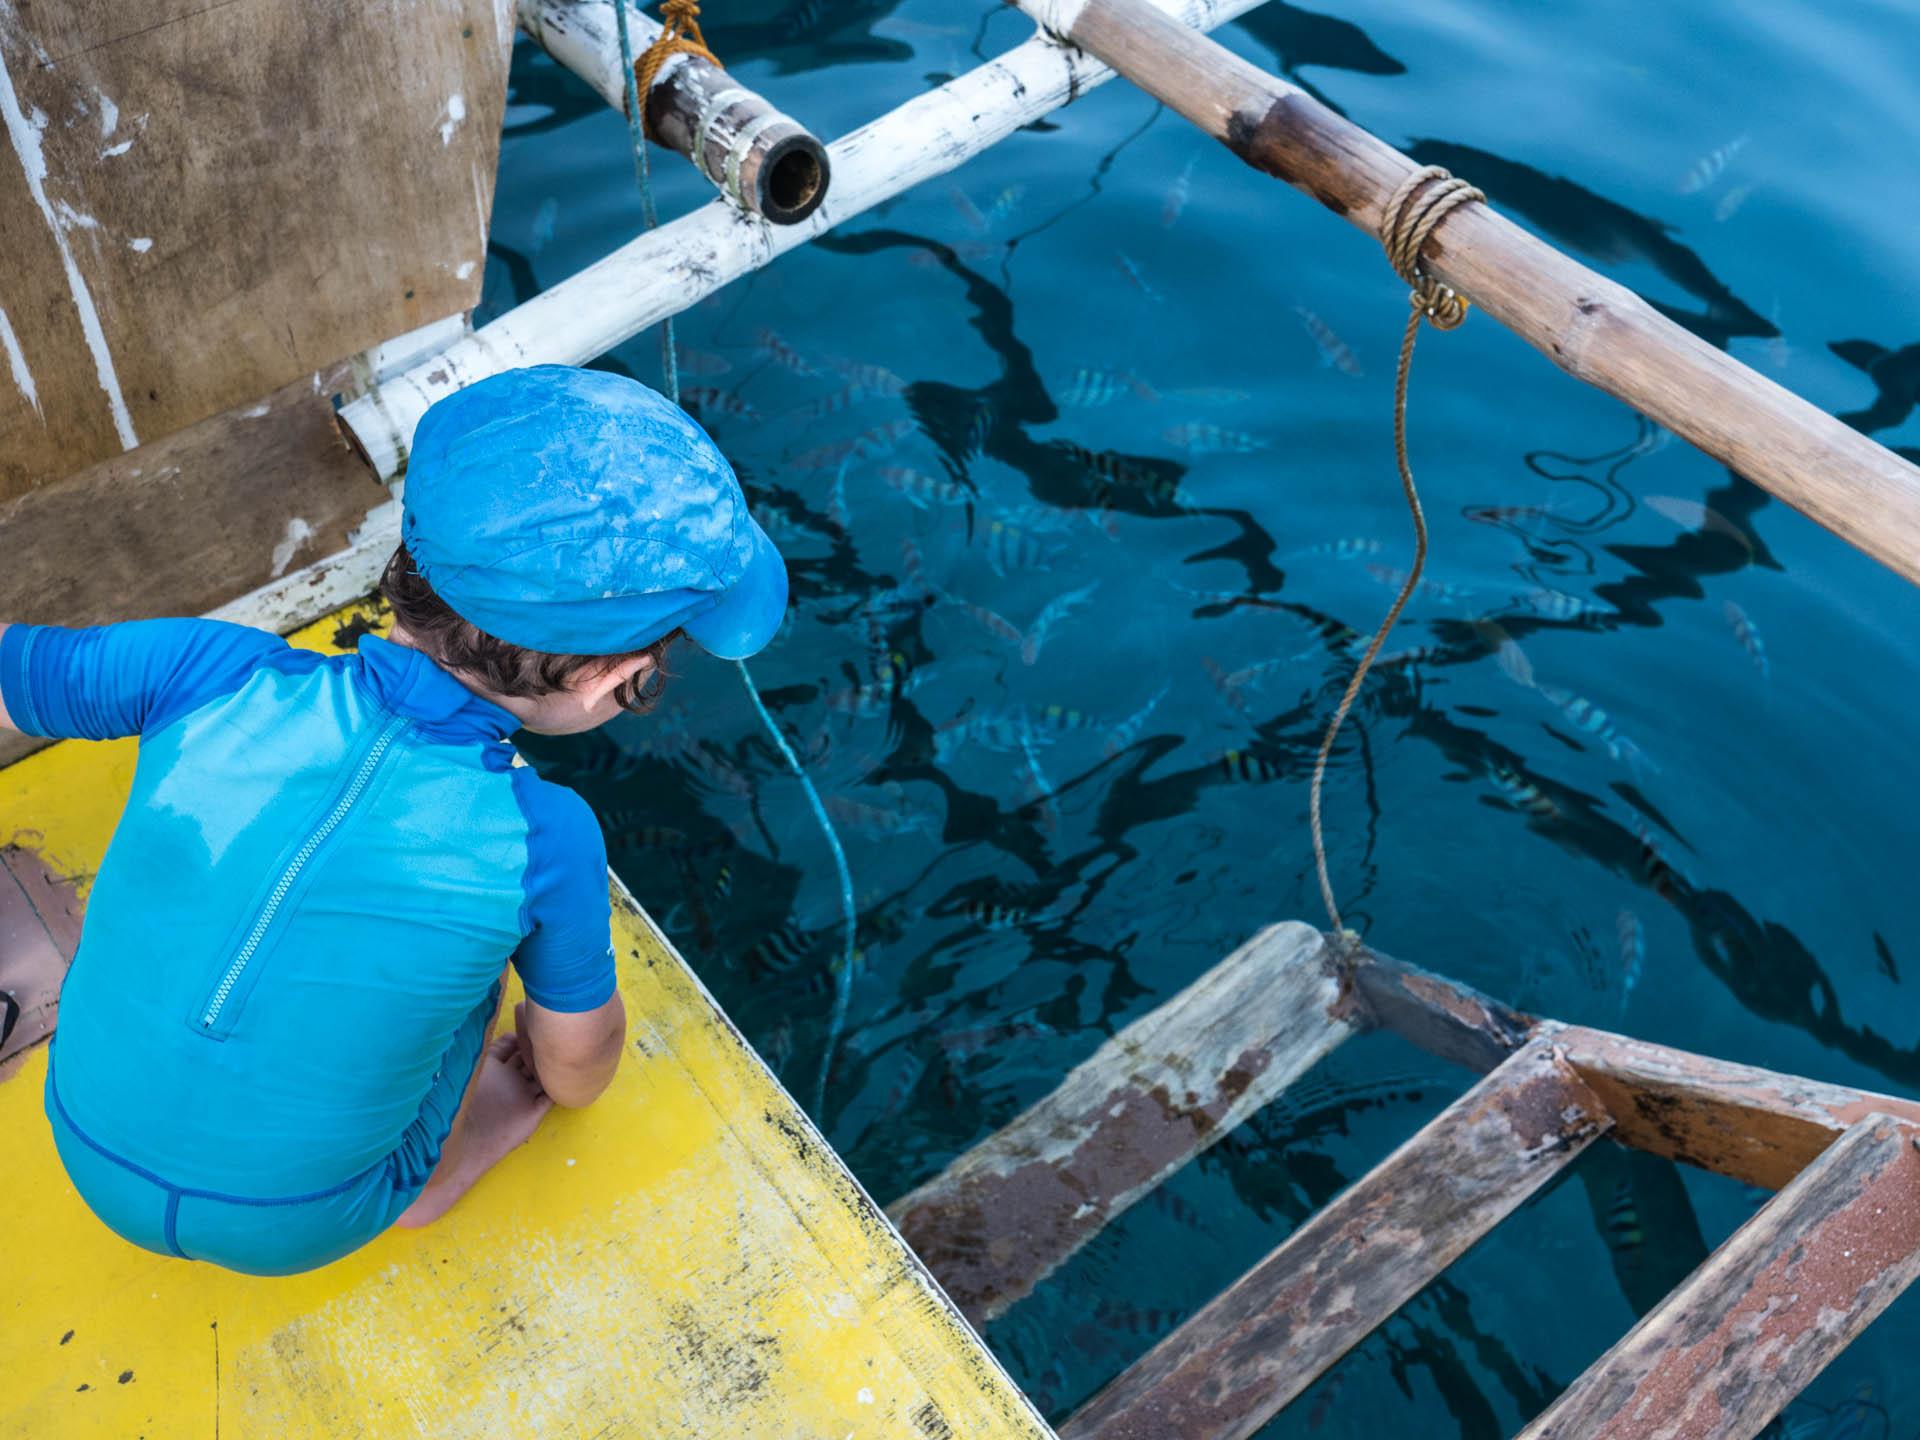 Coron snorkeling - Les globe blogueurs - blog voyage nature